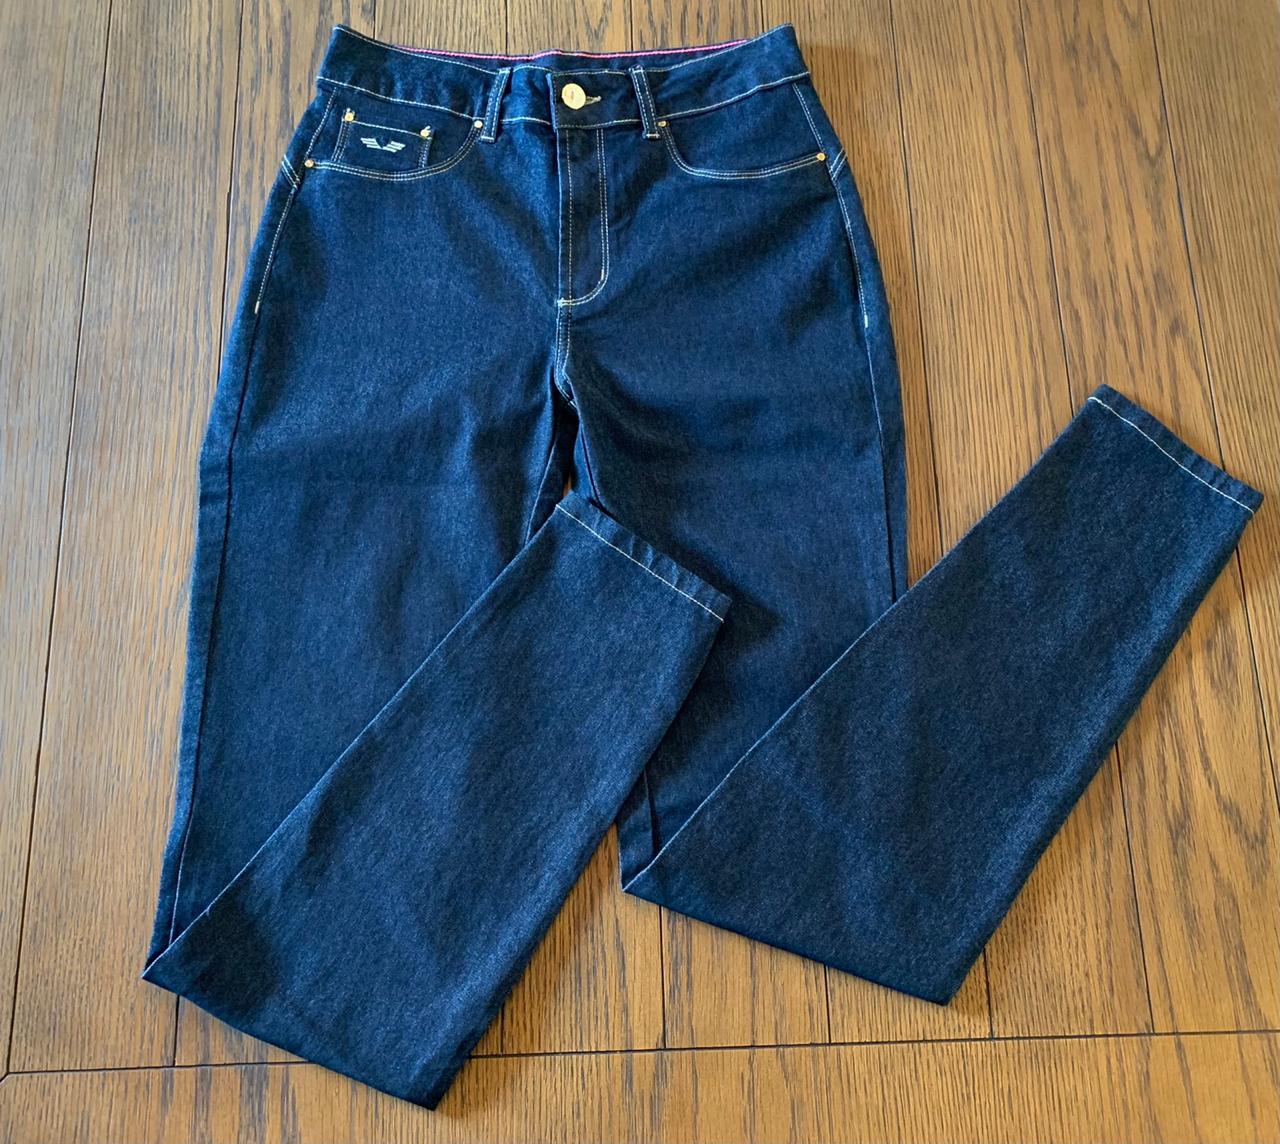 Calça Skinny Power Girl Escura Trich Jeans